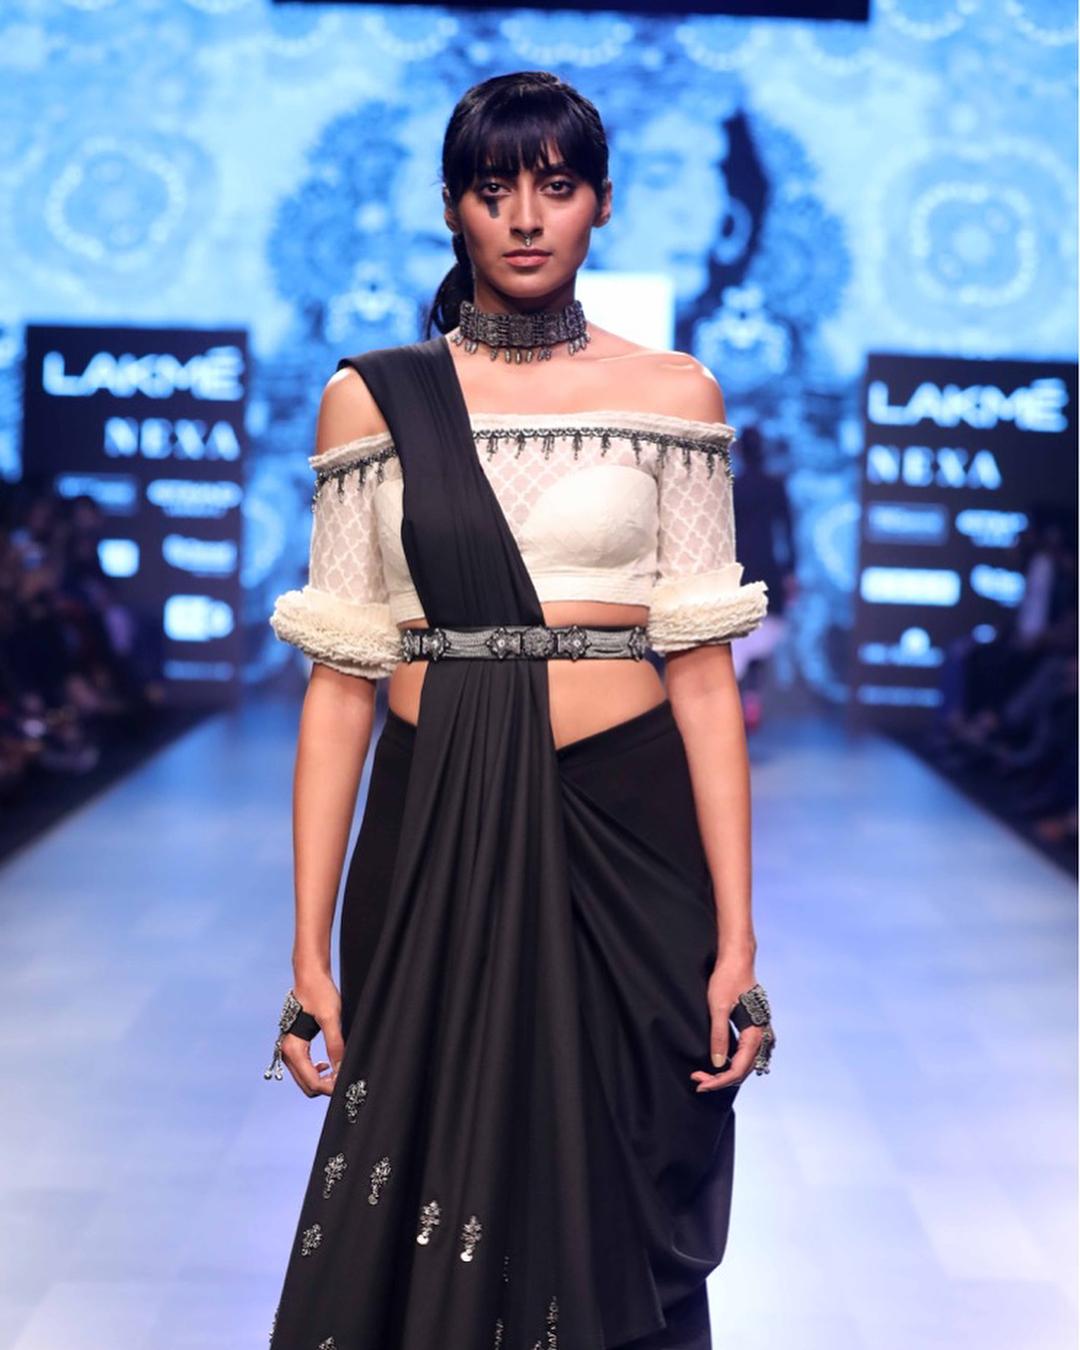 Lakme Fashion Week Summer Resort 2018, Lakme Fashion Week, Bridal Outfit, Shantanu & Nikhil